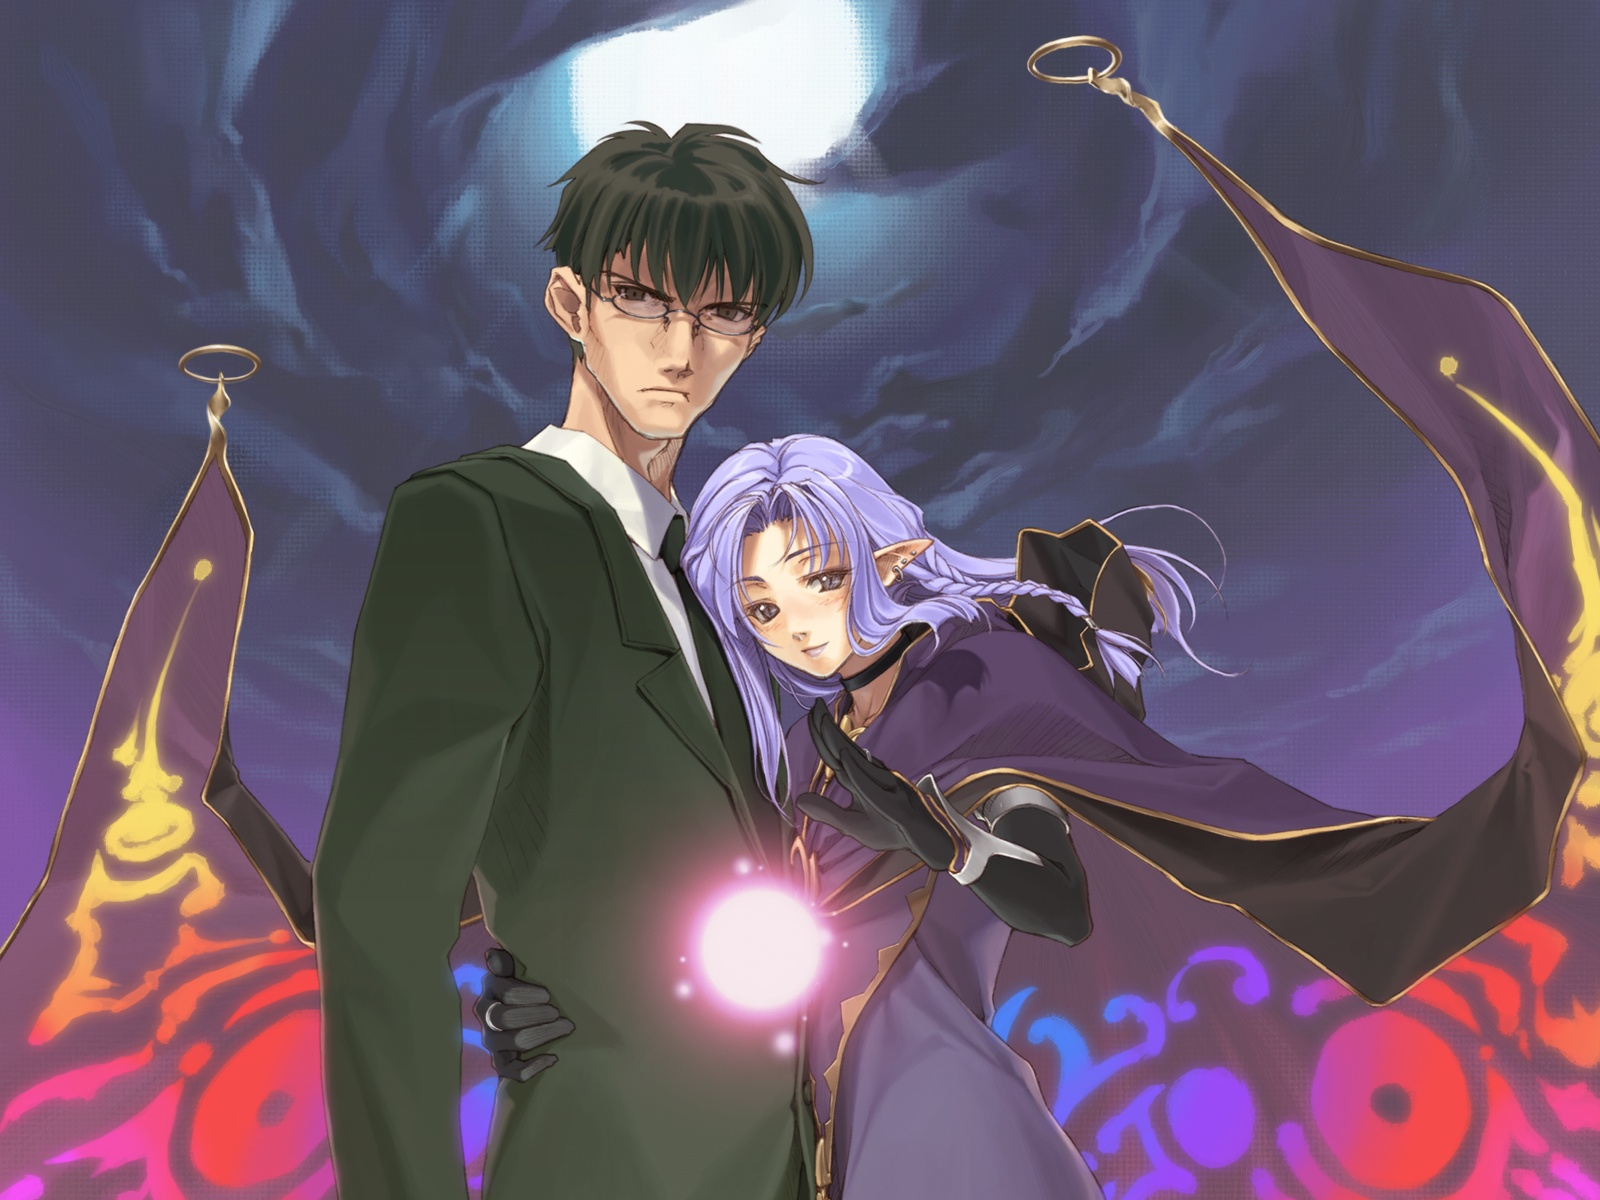 fate_(series) fate/stay_night kuzuki_souichirou medea_(fate) pointed_ears